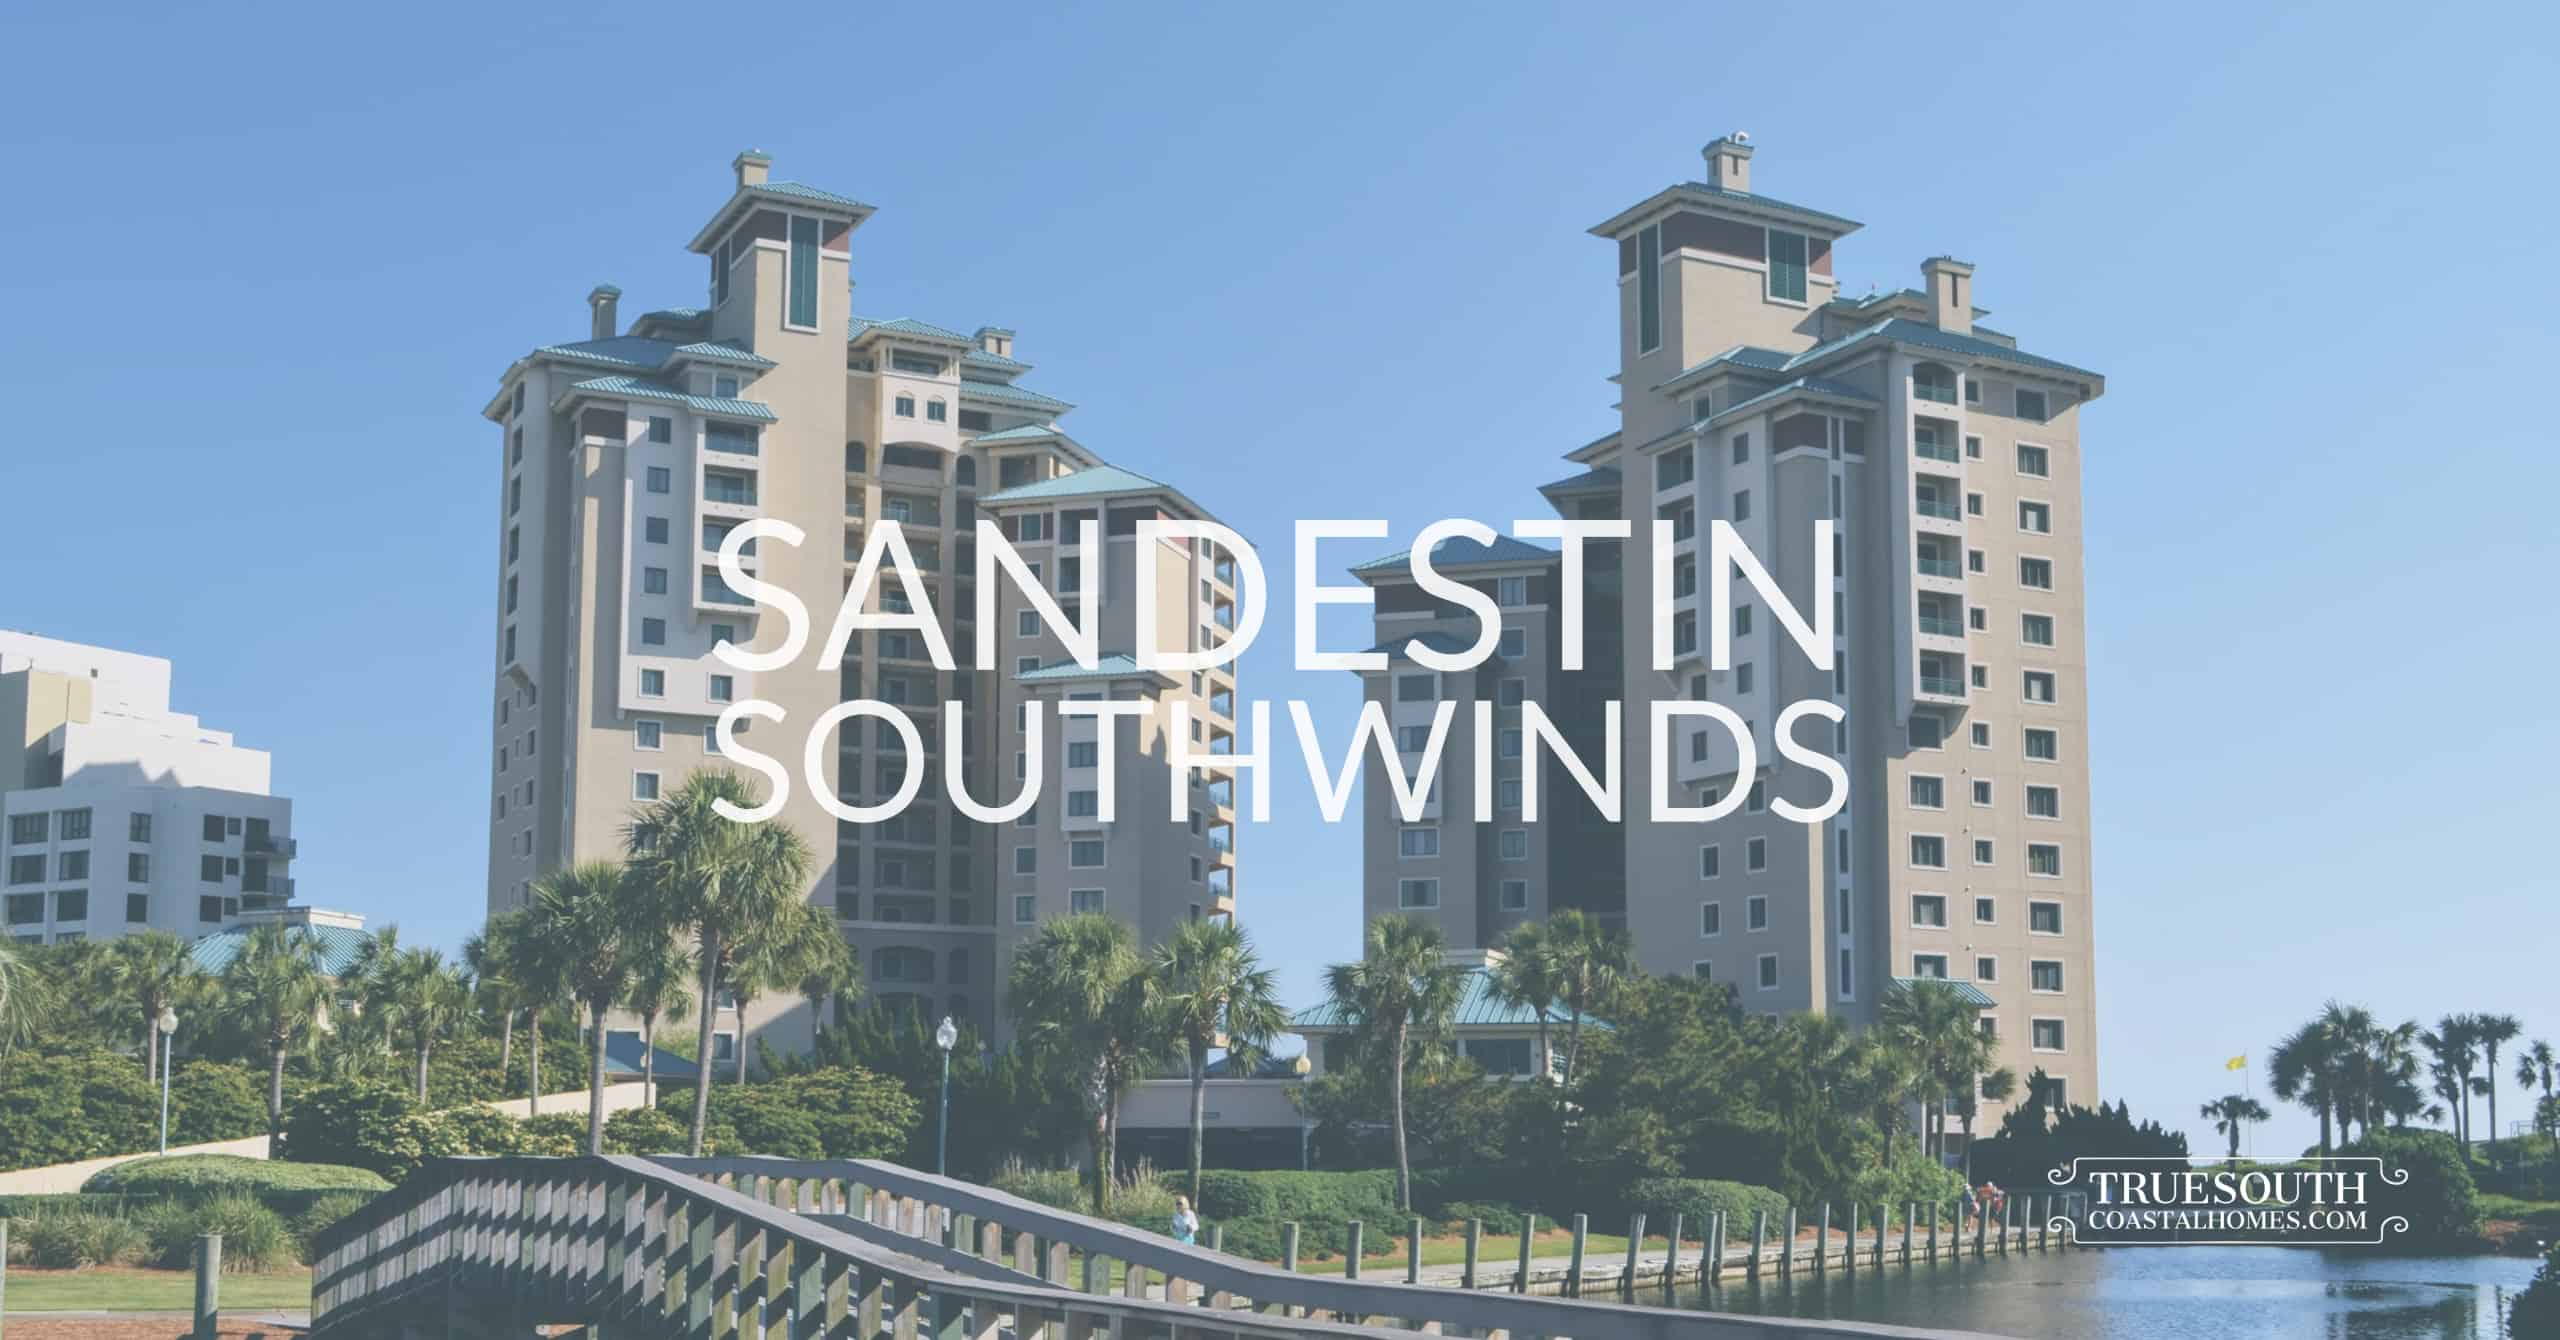 Sandestin Southwinds Condo